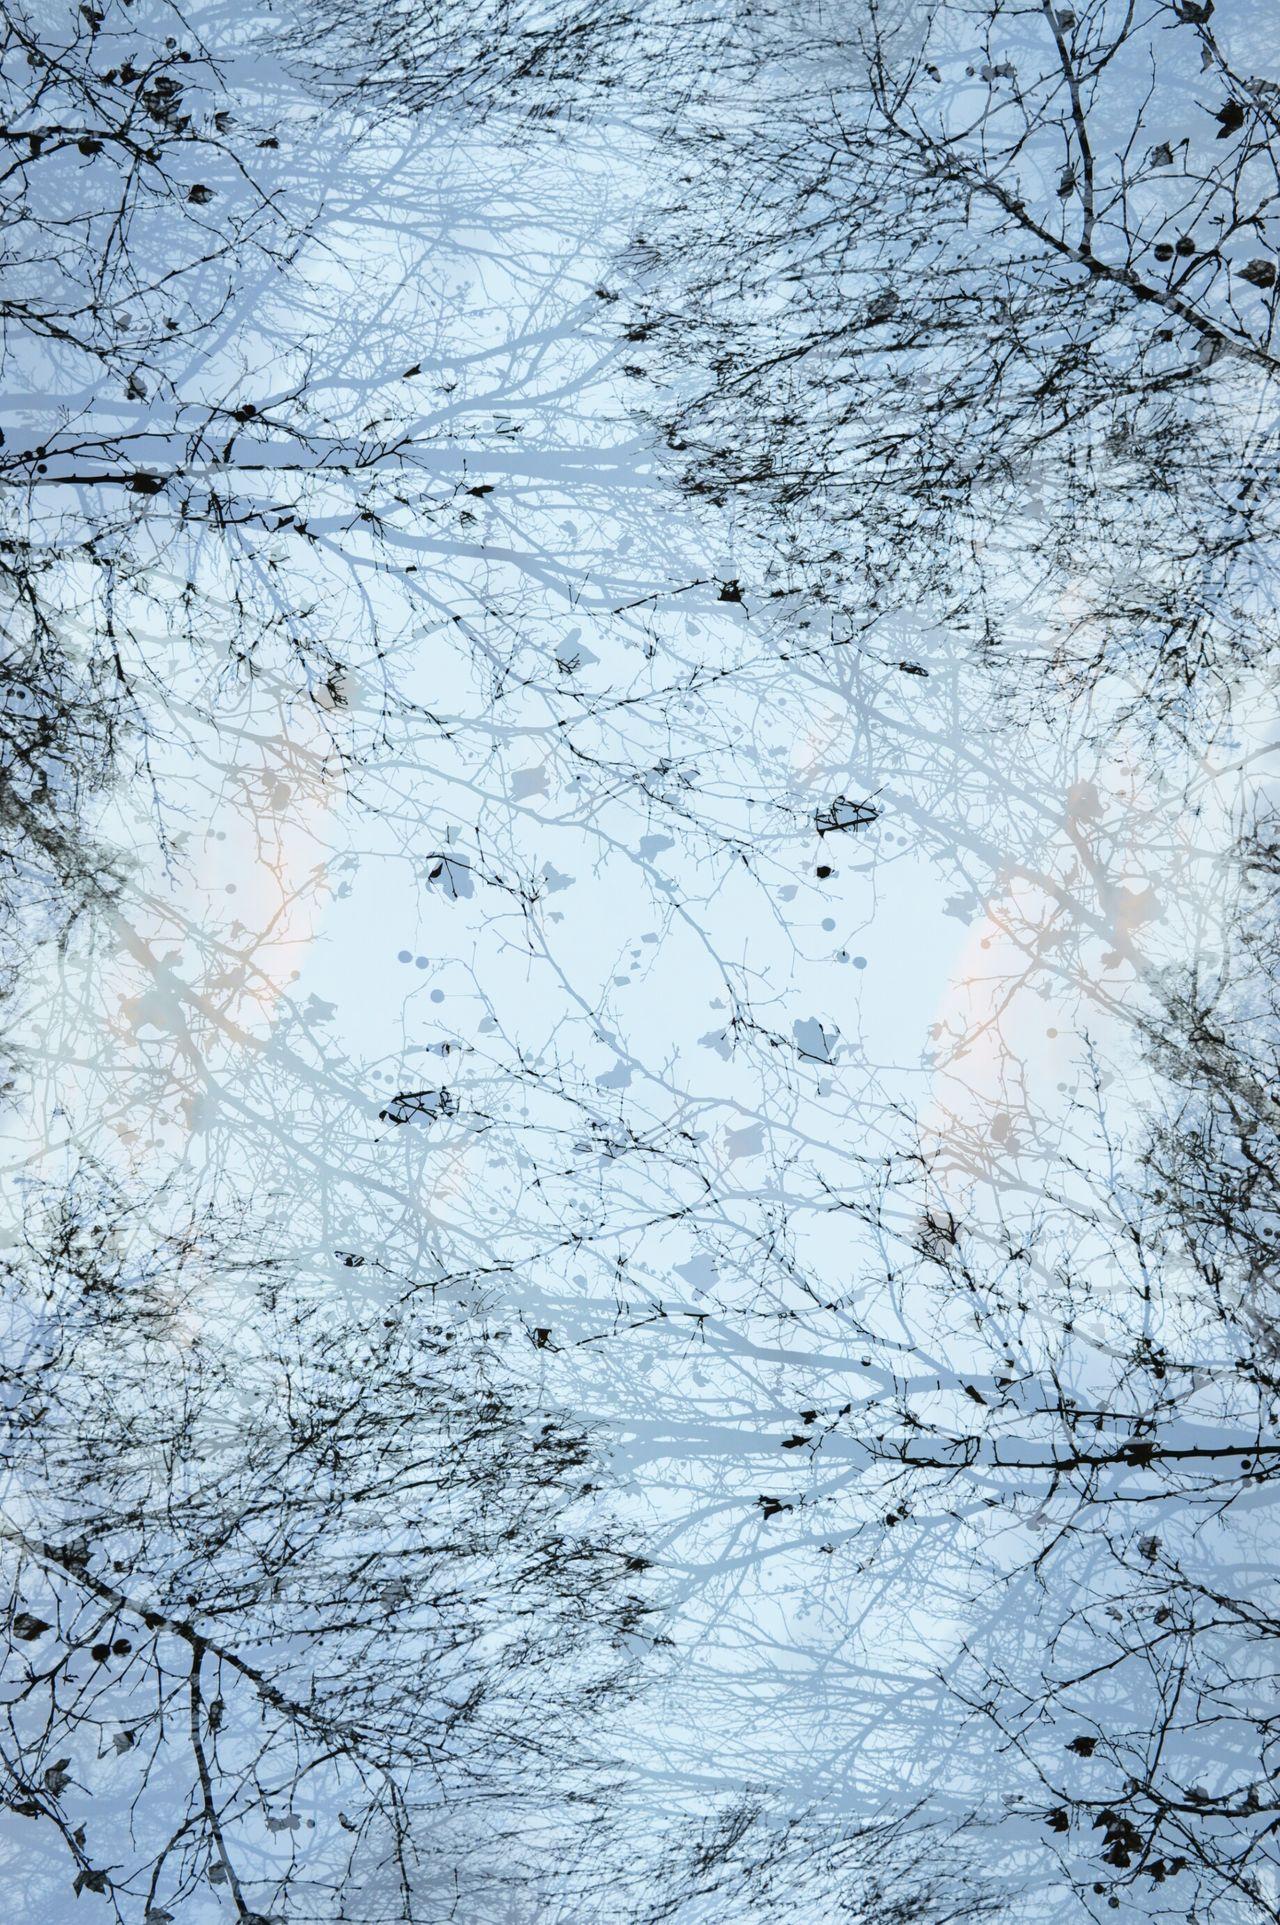 Naturelover #simplebeauty #treebranchees #treemagic #trees #treesilhouette Beauty In Nature Nature Sky